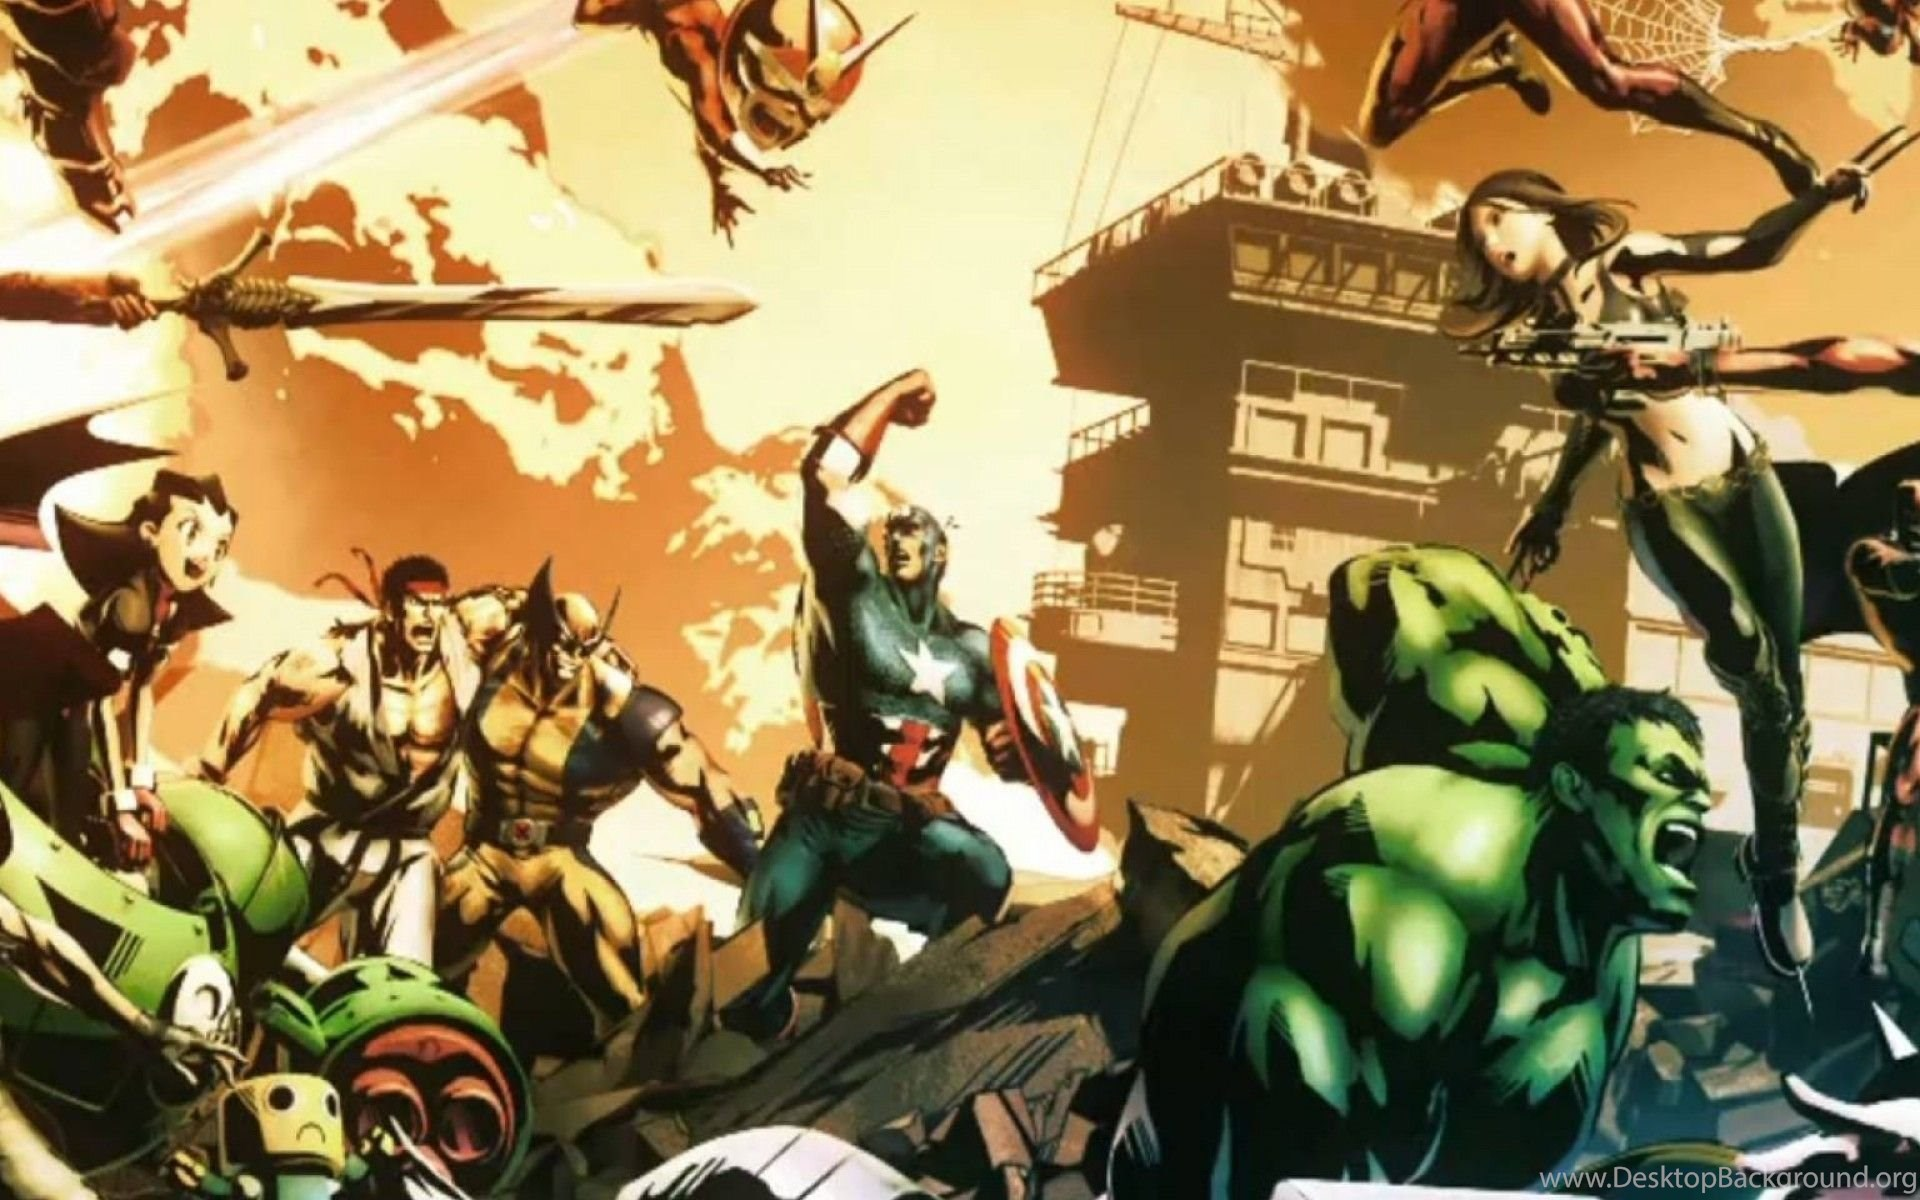 Ultimate Marvel Vs Capcom 3 Boy Wallpapers Yoyowall Com Desktop